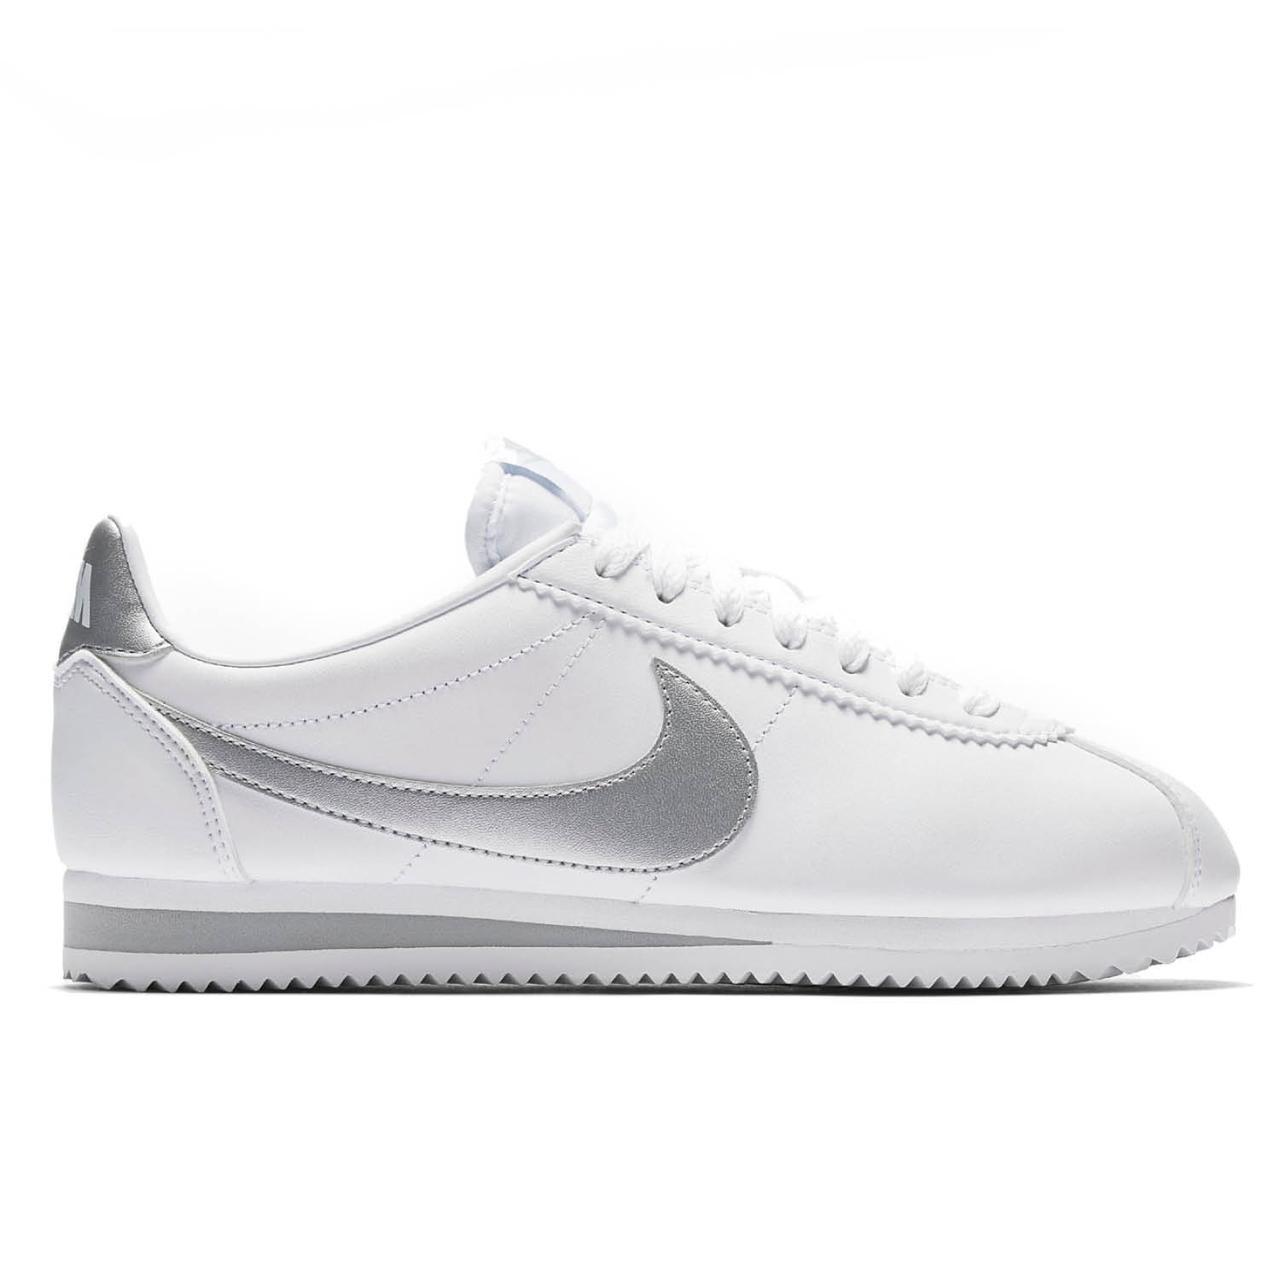 8edf5d6f Оригинальные кроссовки Nike Classic Cortez Leather White/Grey -  Sport-Sneakers - Оригинальные кроссовки